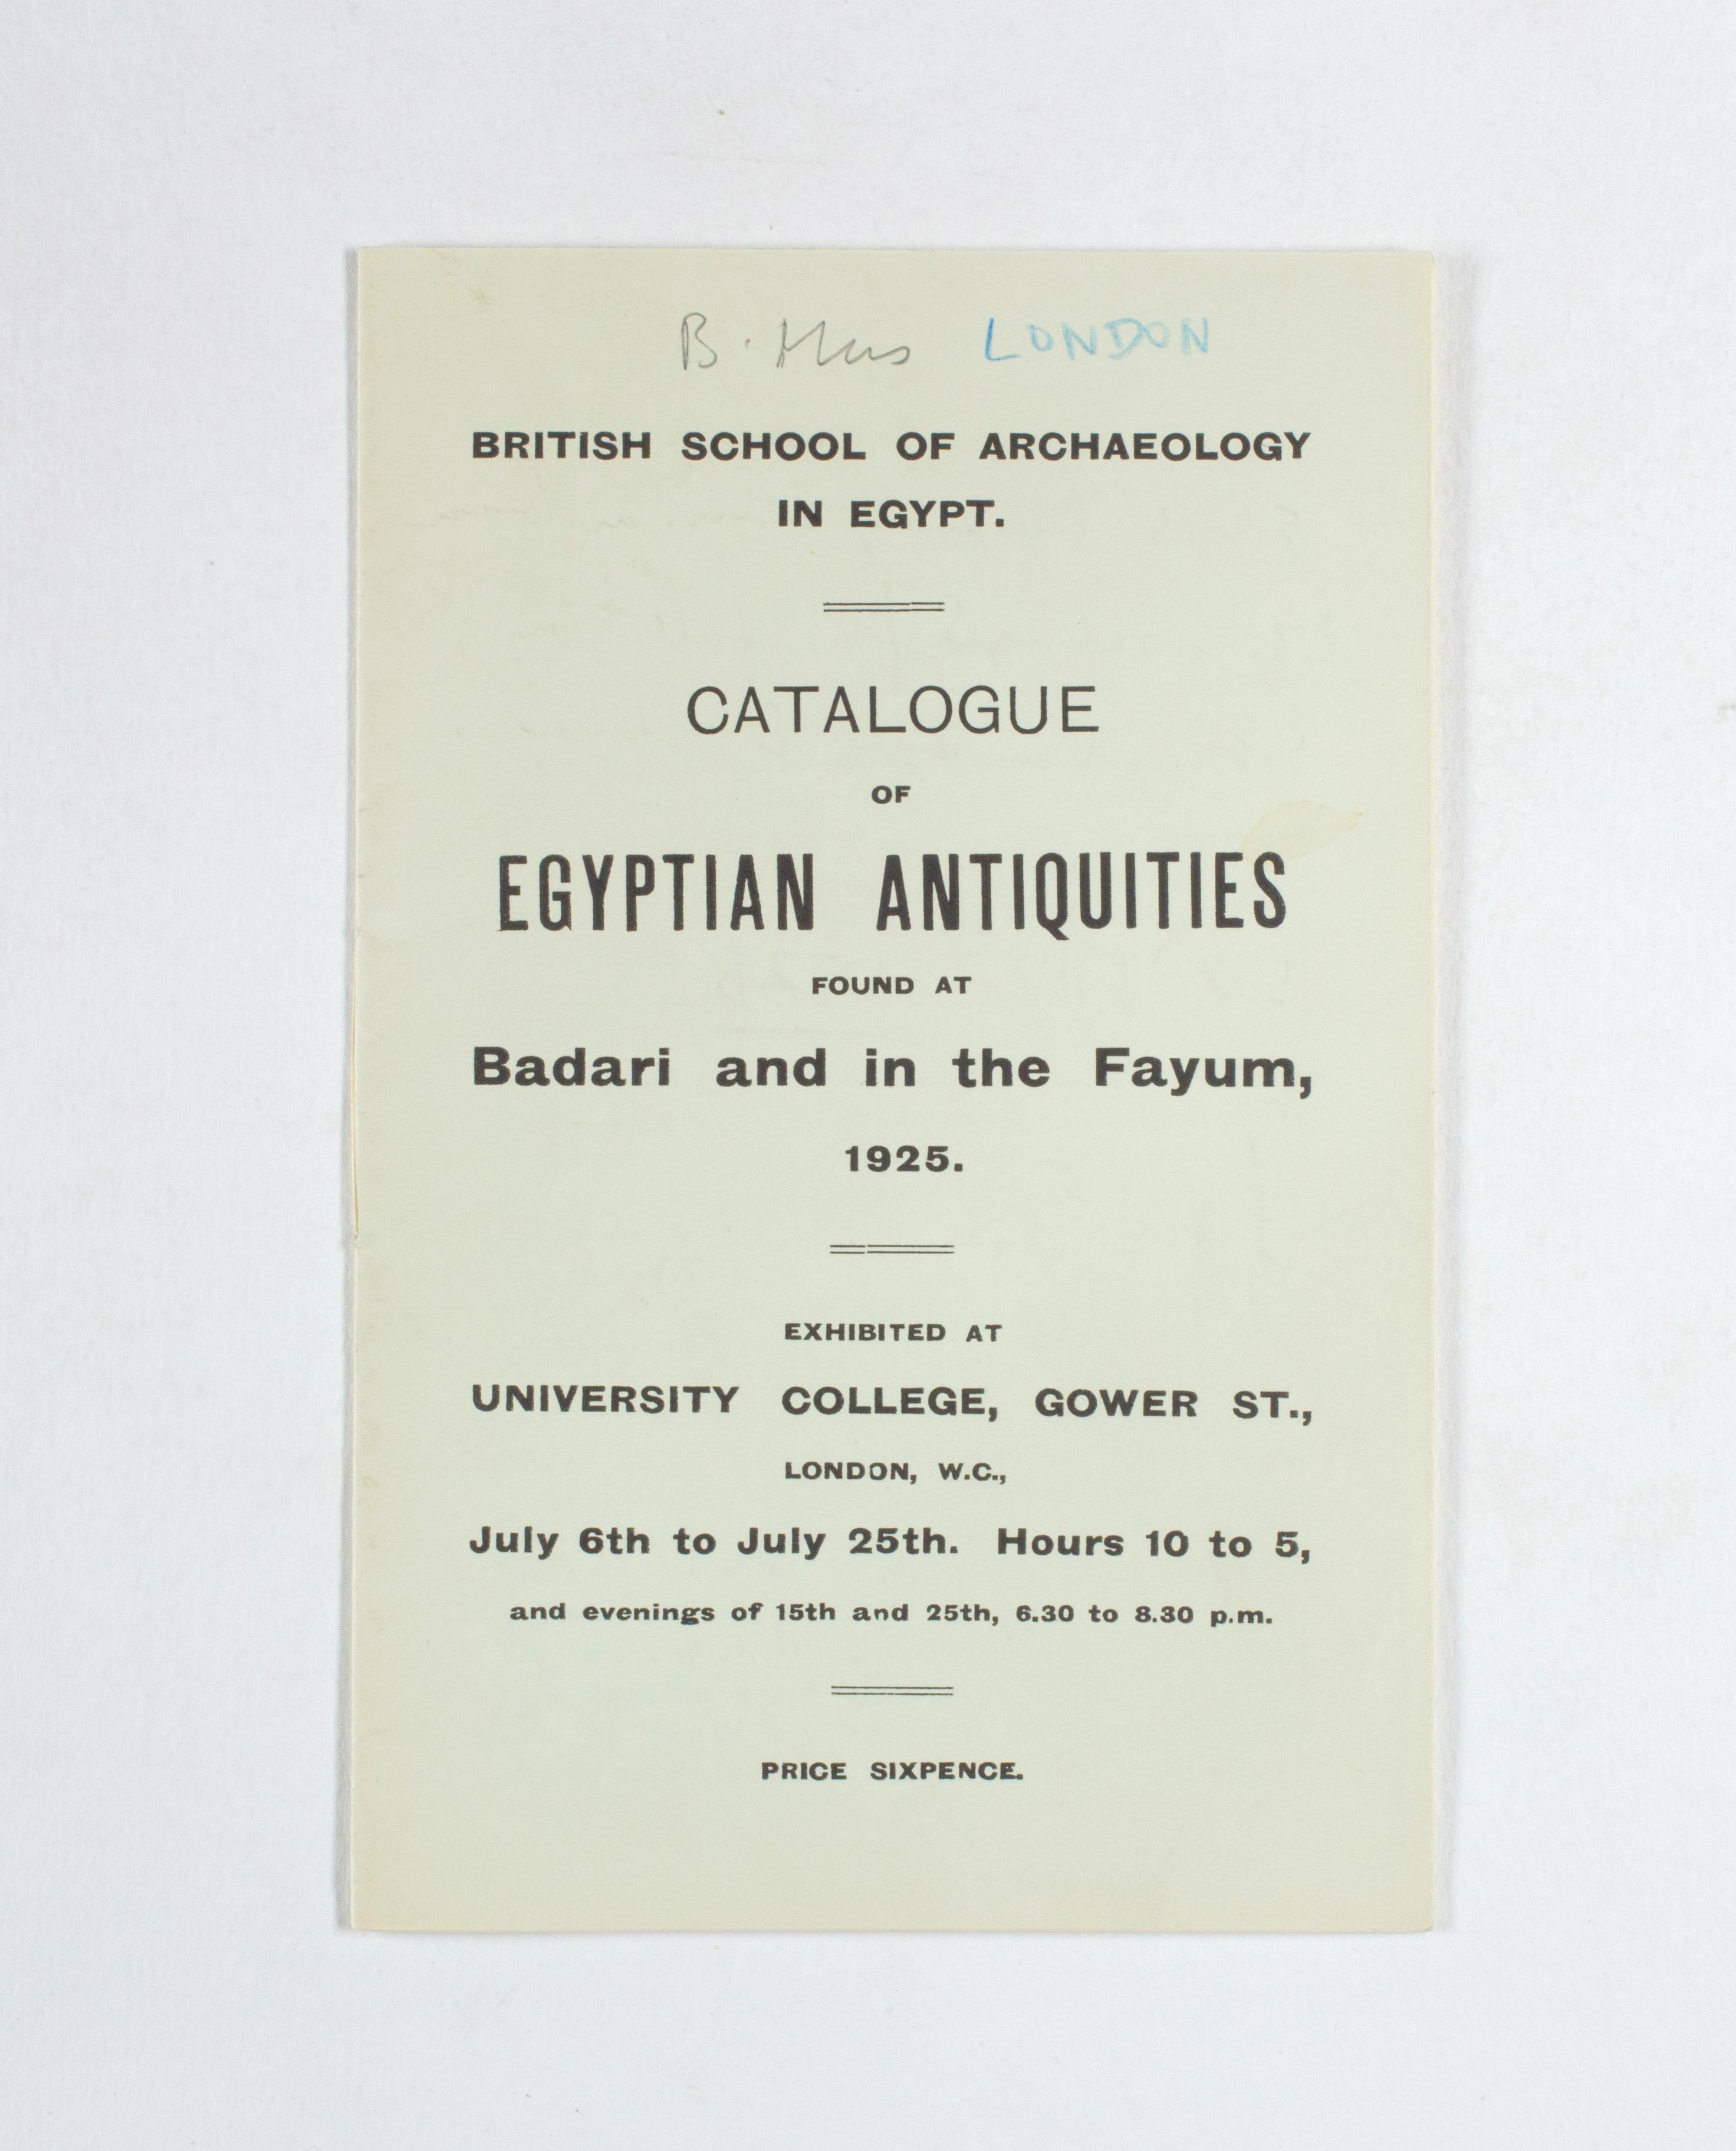 1924-25 Badari, Faiyum Exhibition catalogue PMA/WFP1/D/28/29.1